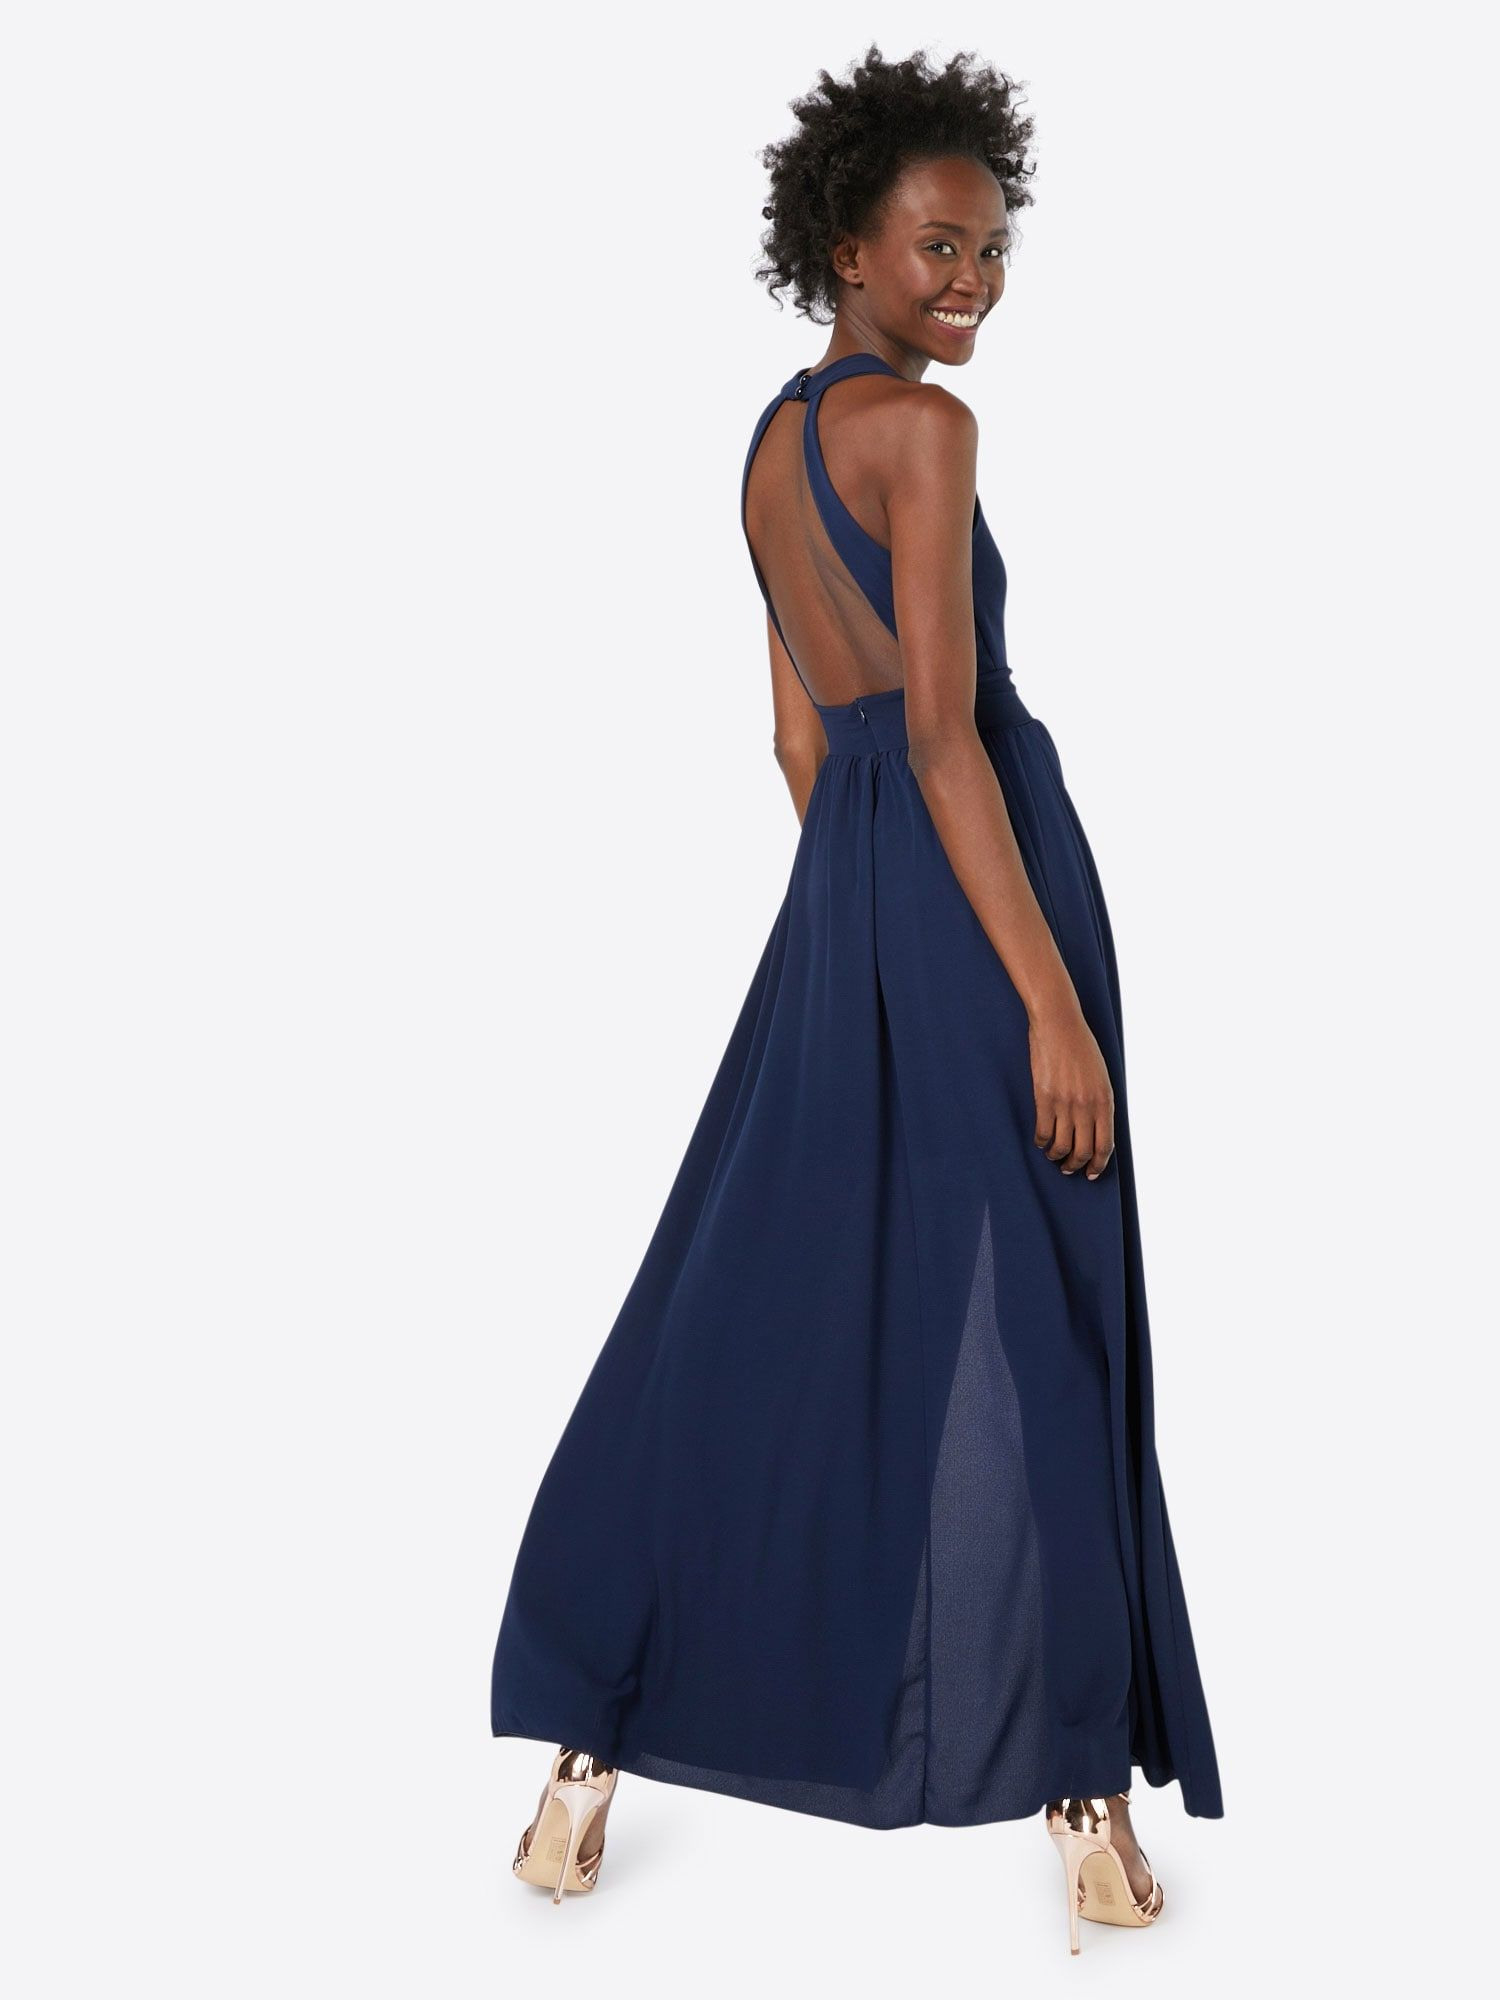 Formal Elegant Wal G Abendkleid Galerie Leicht Wal G Abendkleid Vertrieb